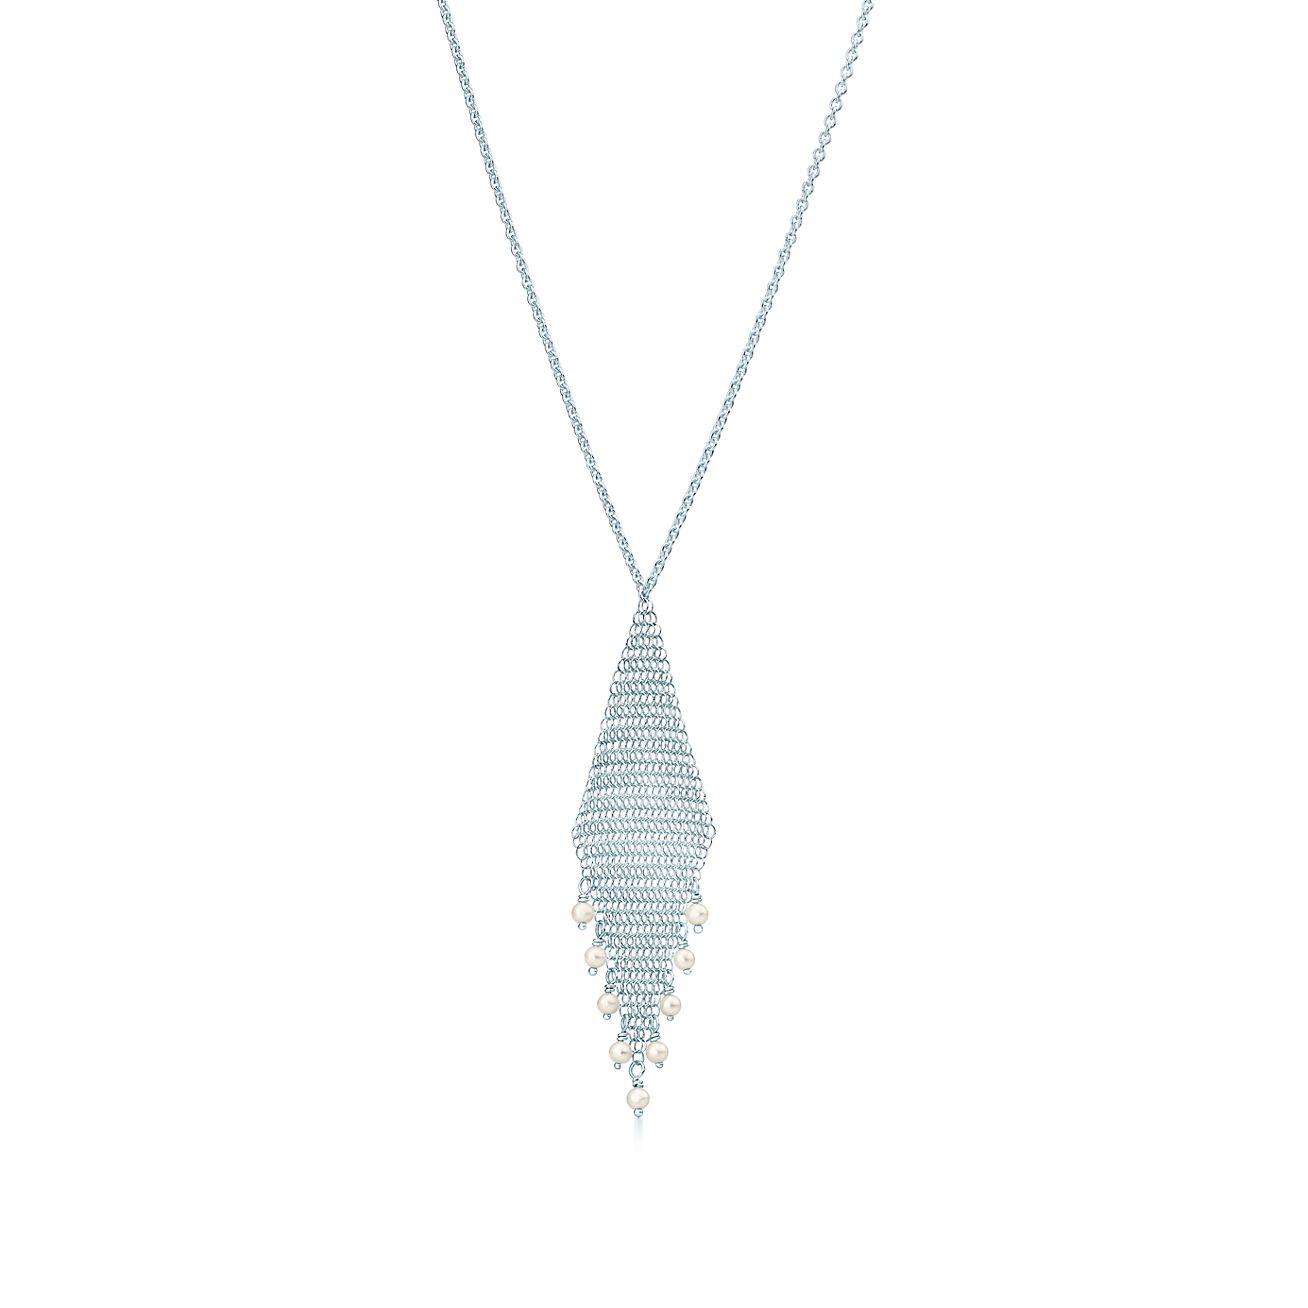 Elsa Peretti Mesh tassel earrings in sterling silver with freshwater pearls Tiffany & Co.